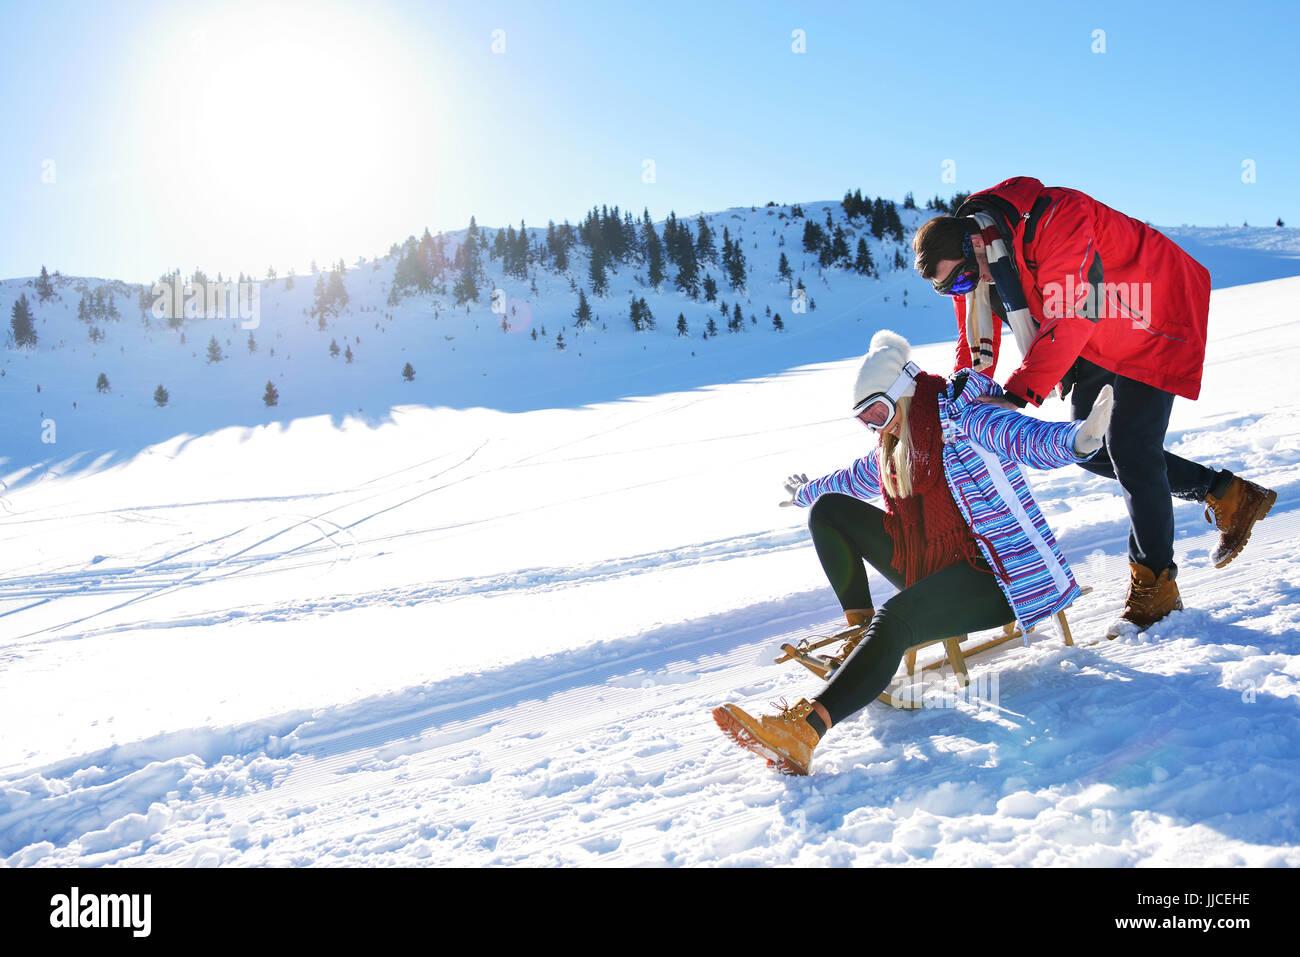 Coppia giovane slittino e godendo sulla soleggiata giornata invernale Immagini Stock